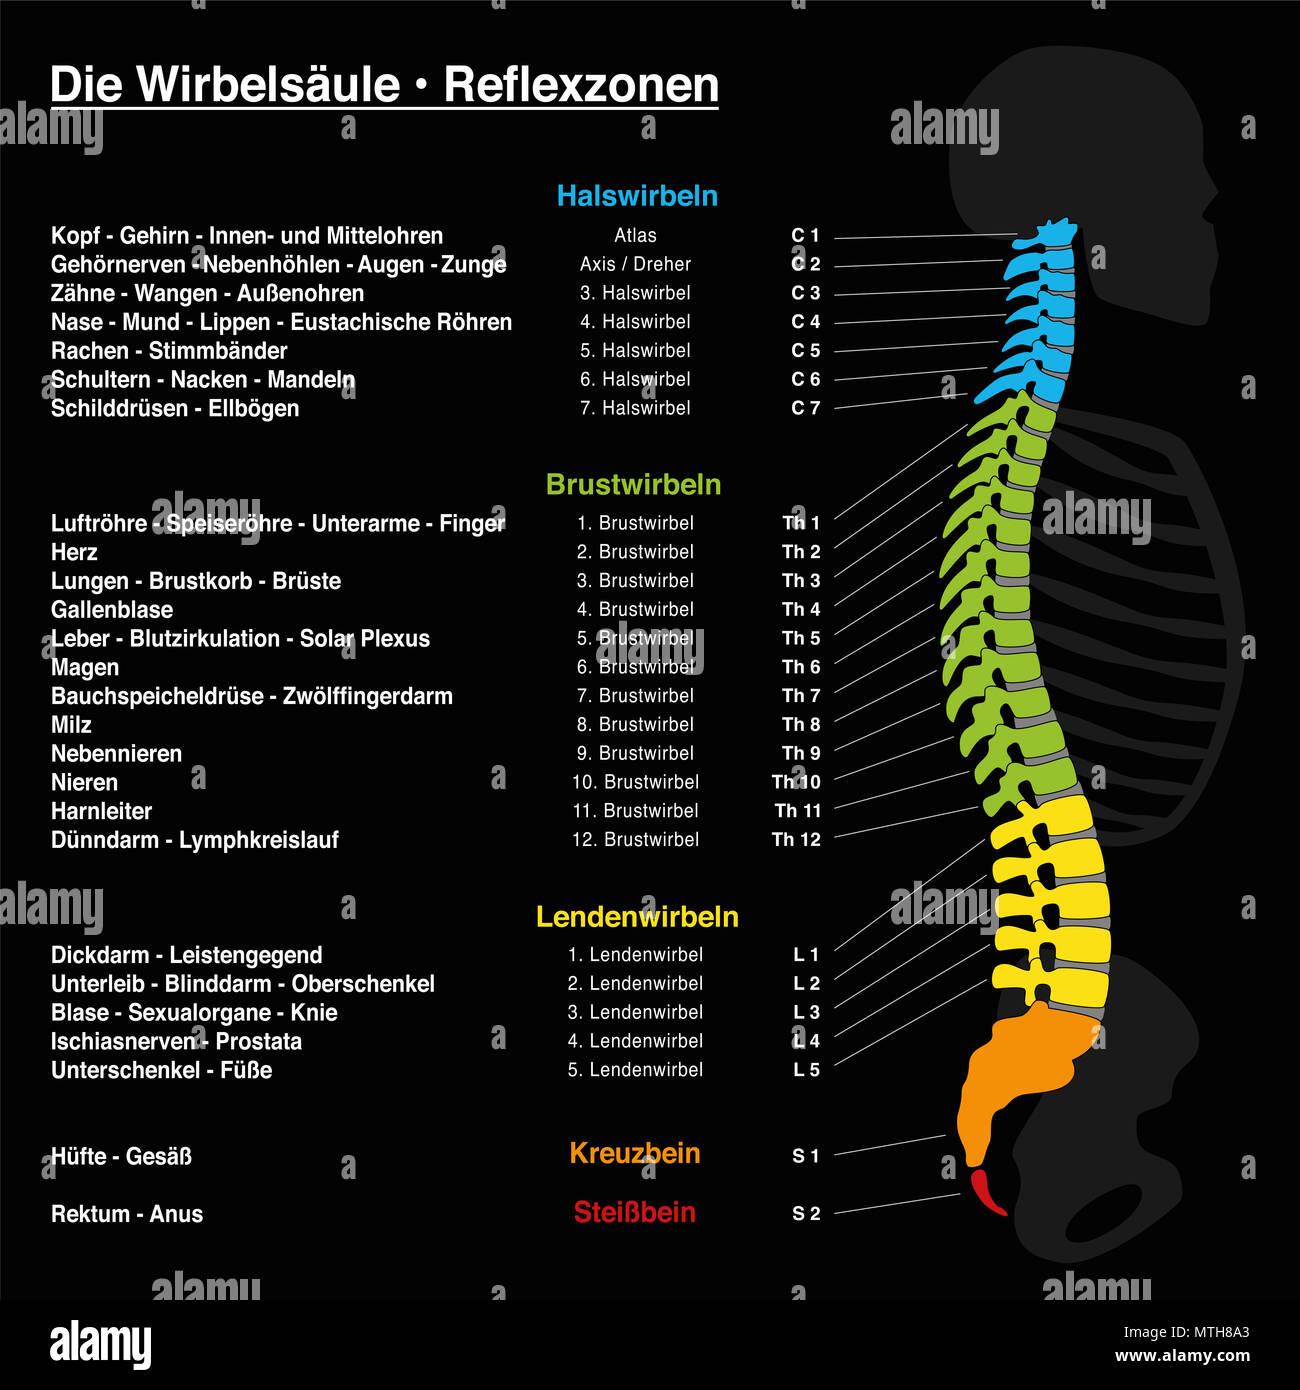 Spine Reflexology With Description Of The Corresponding